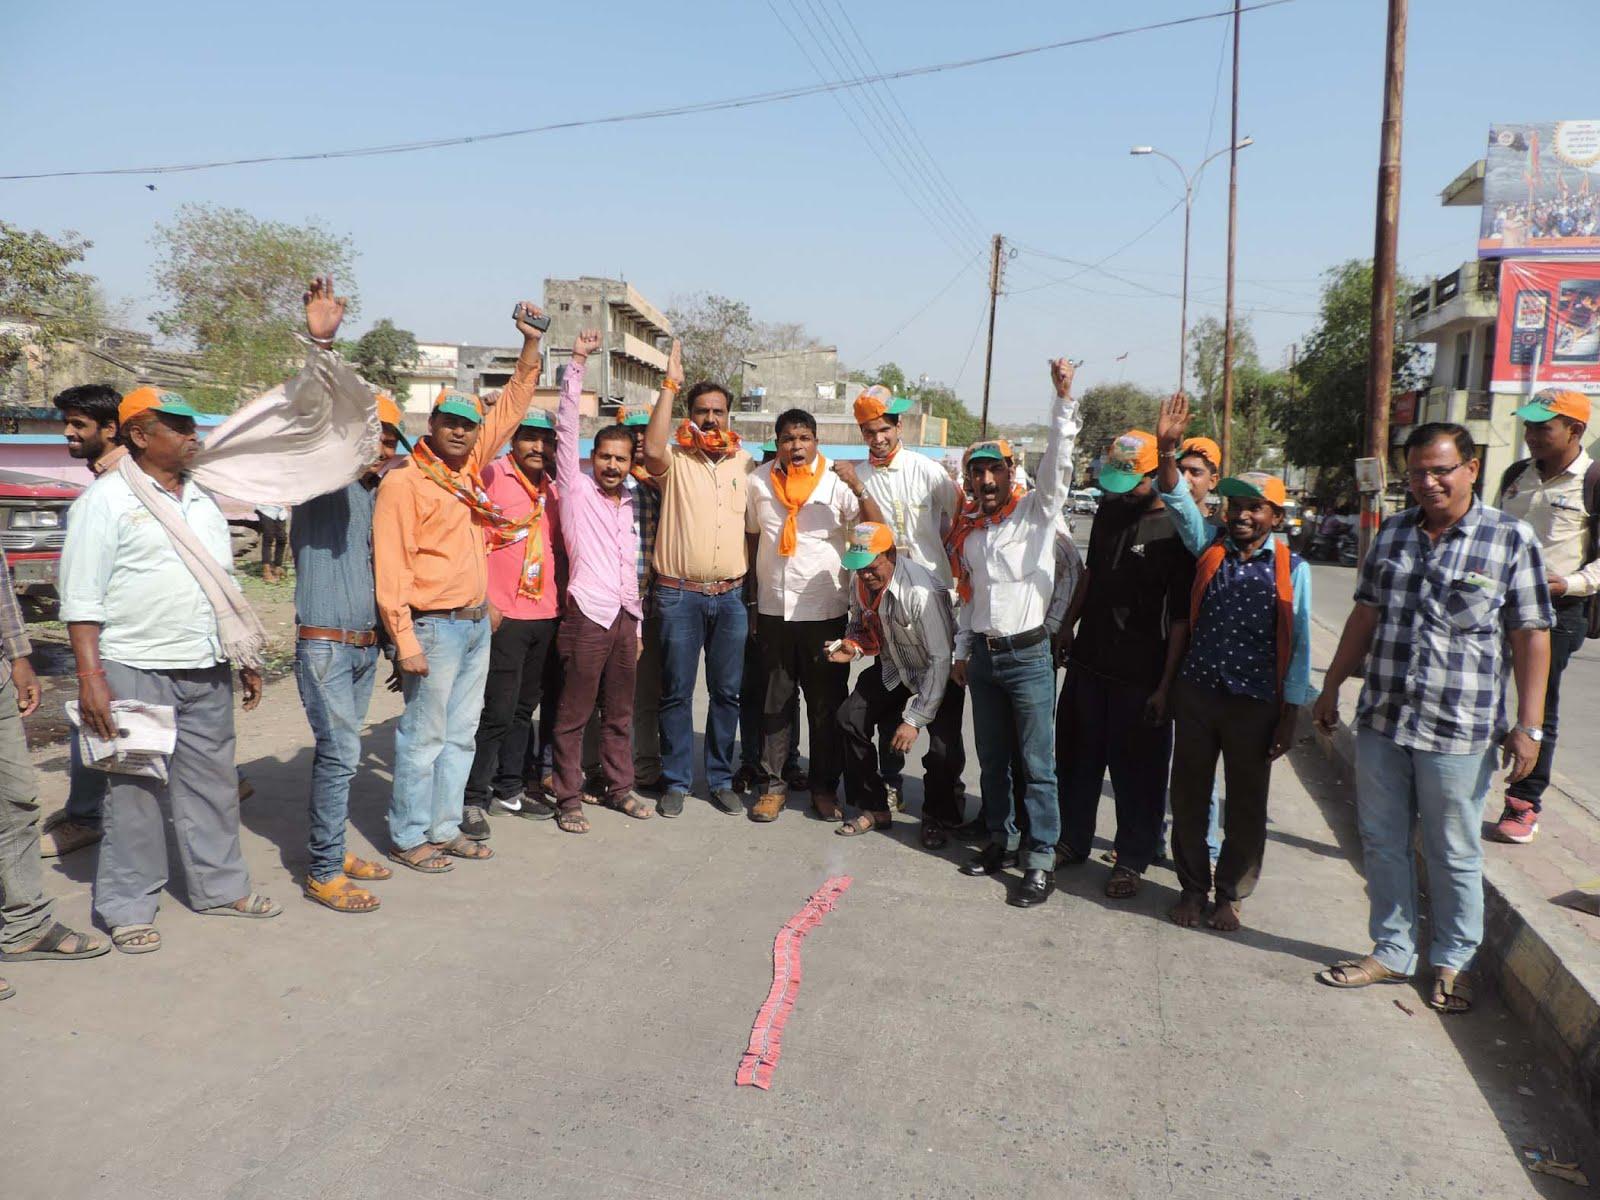 Nagar-Mandal-bjp-celebrated-triumphant-day-with-fireworks-नगर मंडल ने उत्साह एवं आतिशबाजी के साथ मनाया विजयोत्सव दिवस